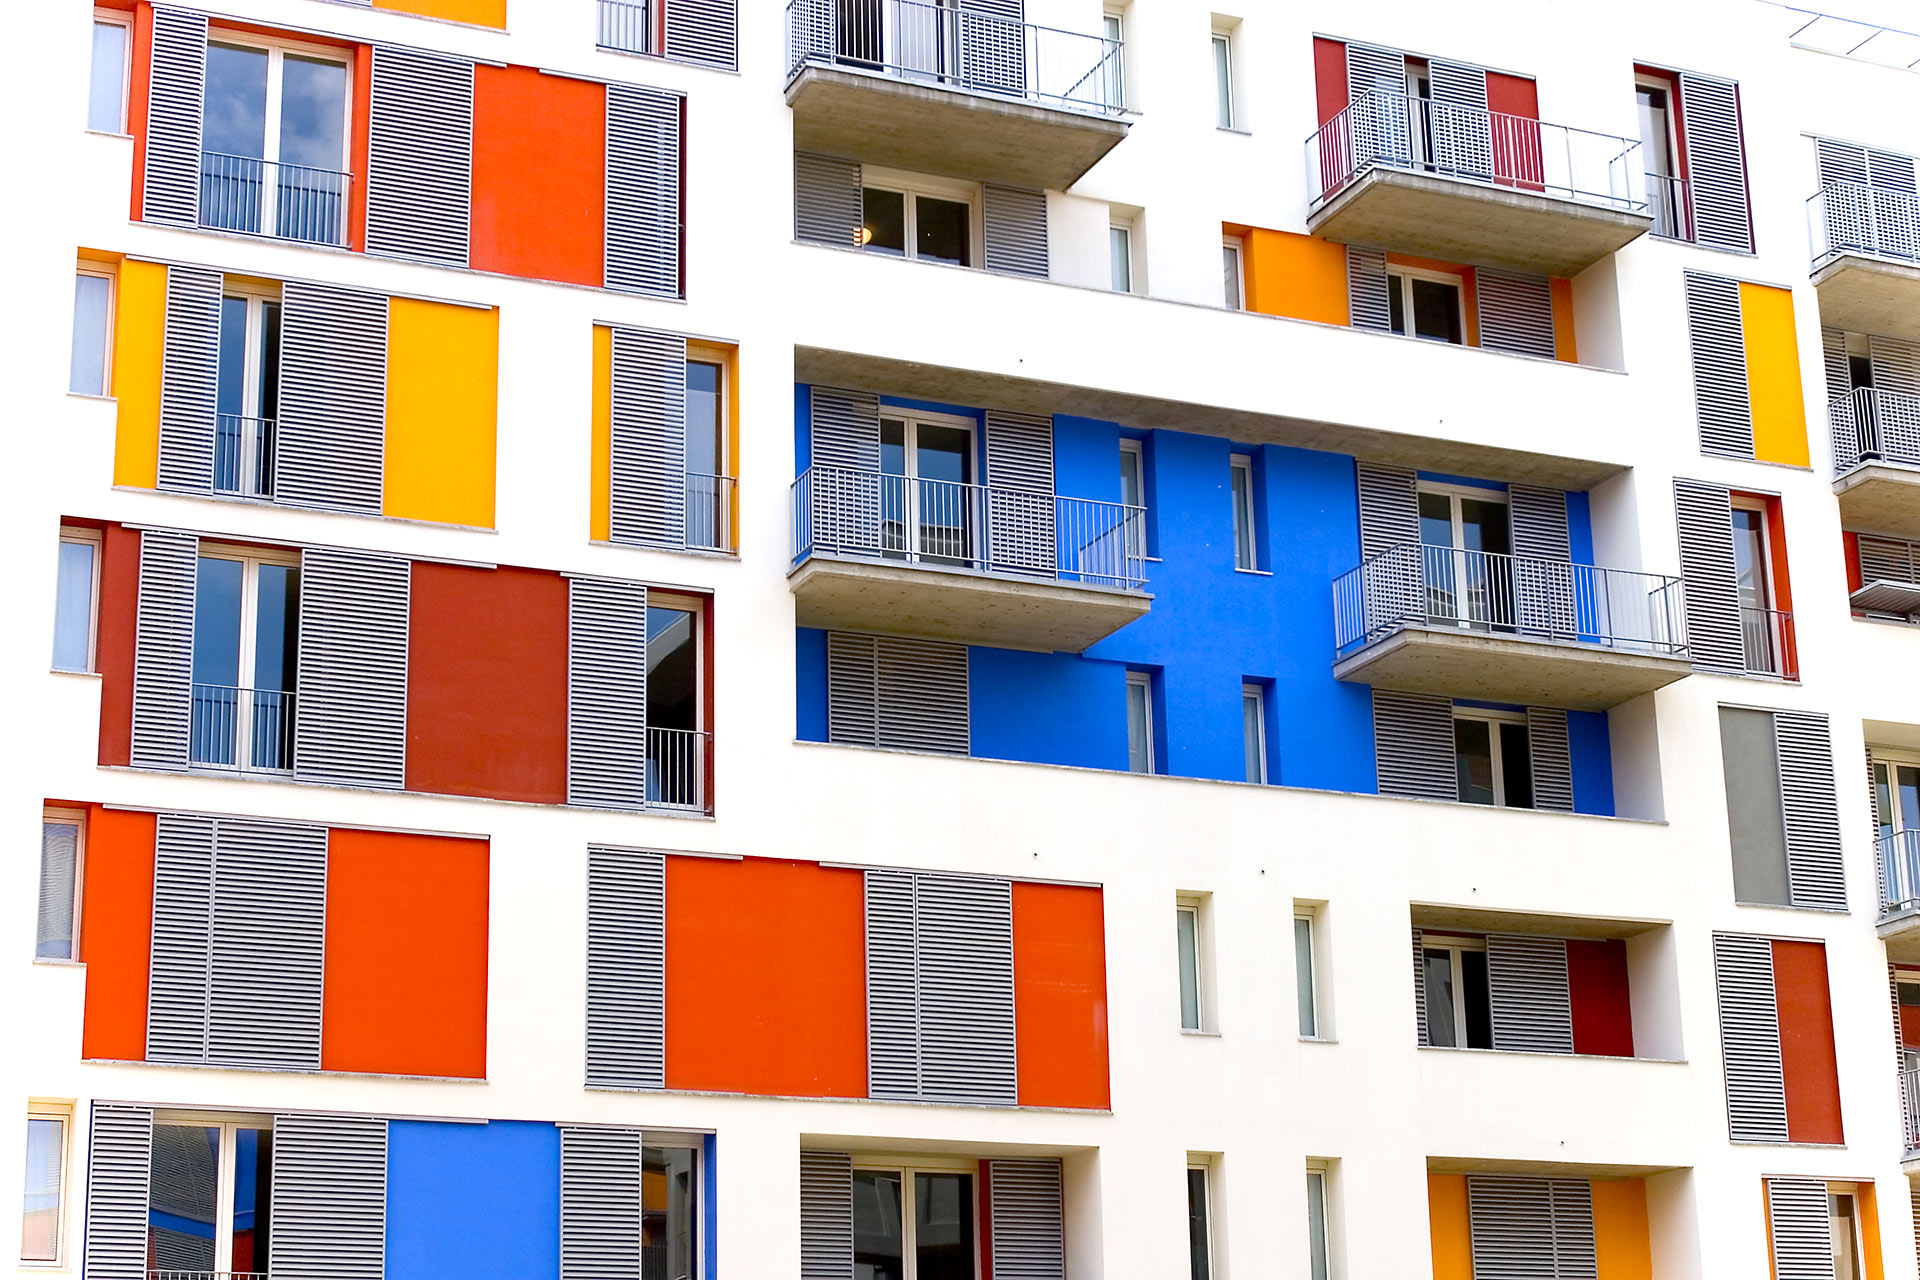 Residenze Villaggio Olimpico 2006 Torino - Gem srl